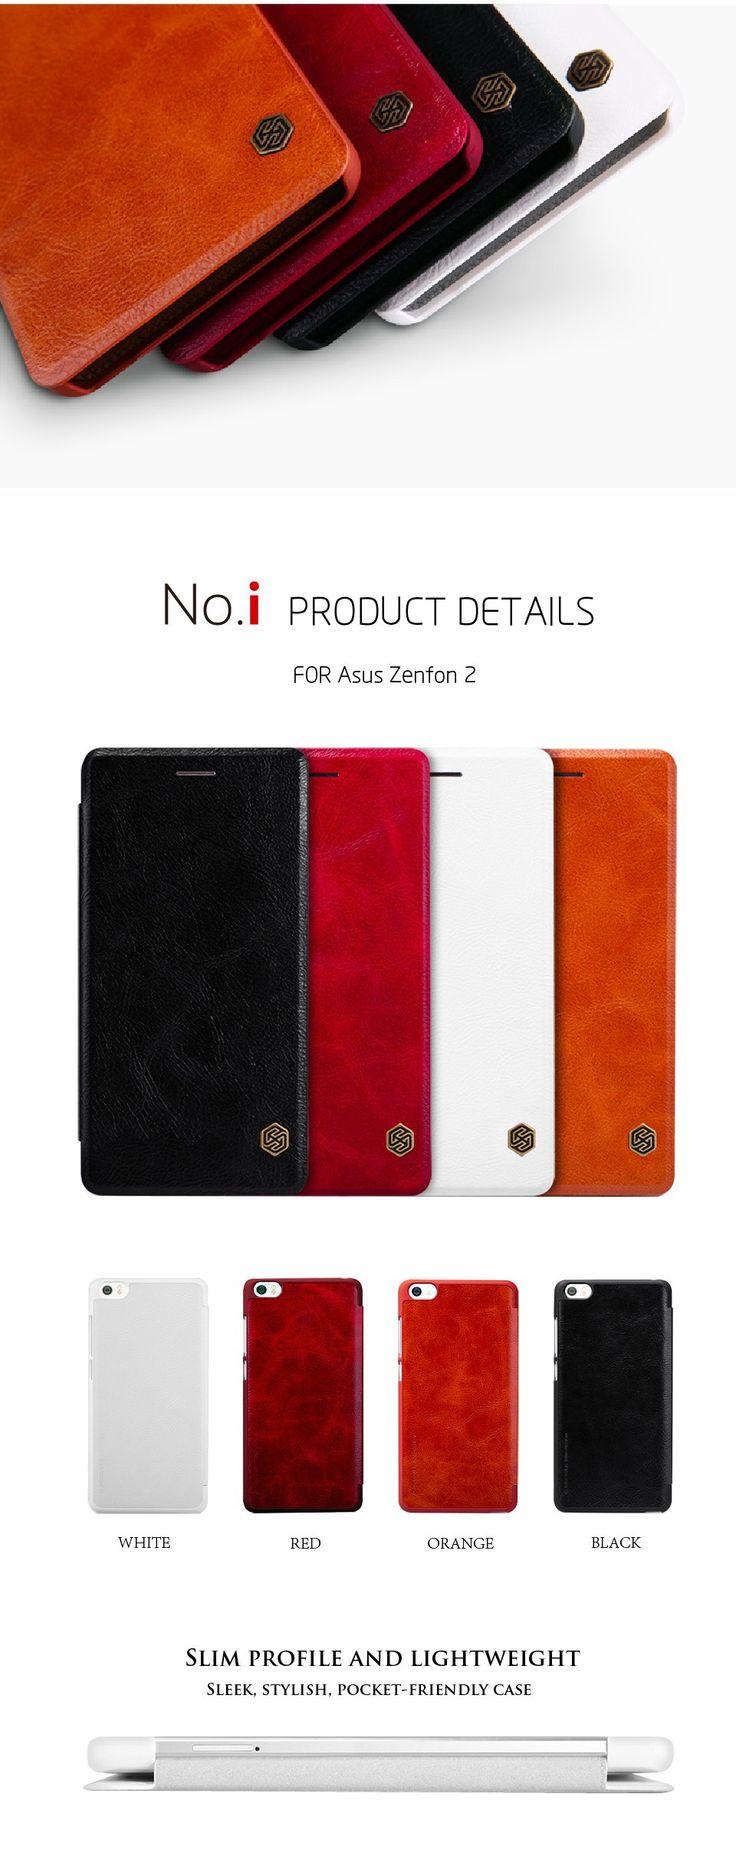 Luxury Zenfone 2 Case, Got it here:http://www.aliexpress.com/item/03-5-5-Inch-Flip-Case-For-Asus-Zenfon-2-Leather-Case-Original-Design-Anti-Drop/32345309723.html